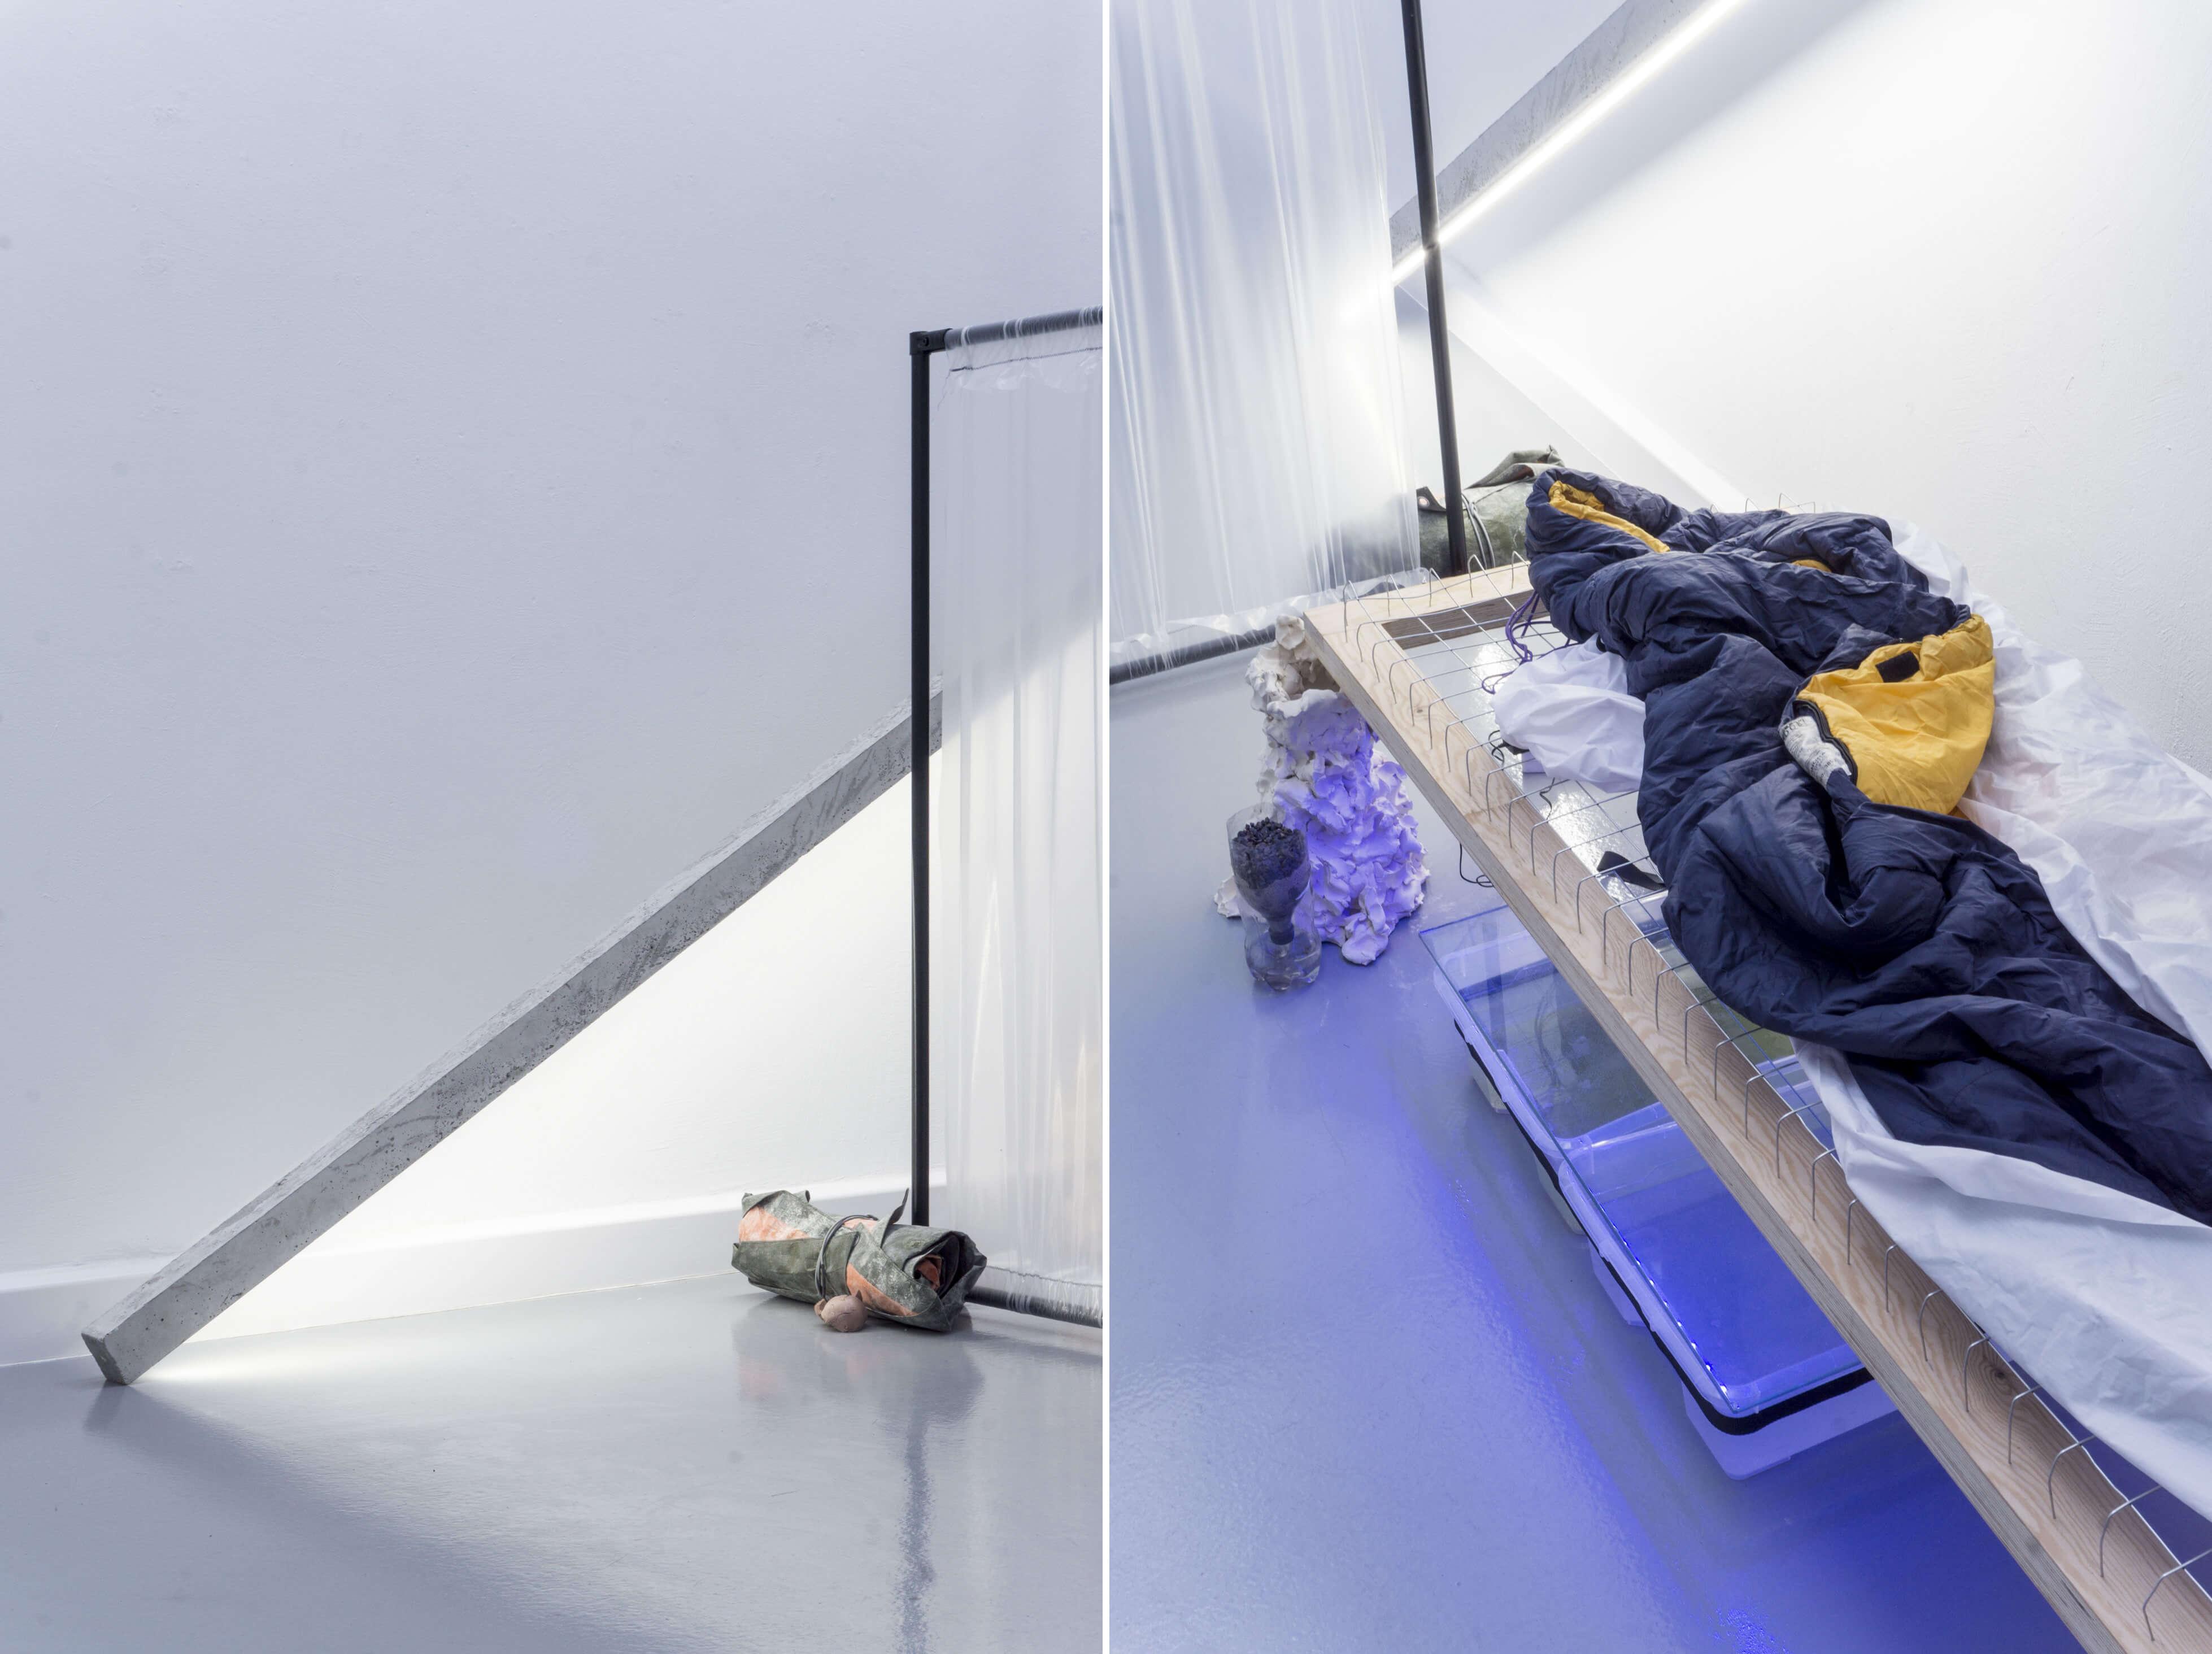 Installationsansichten Alexander Poliček. Links Metall, rechts ein Schlafsack.